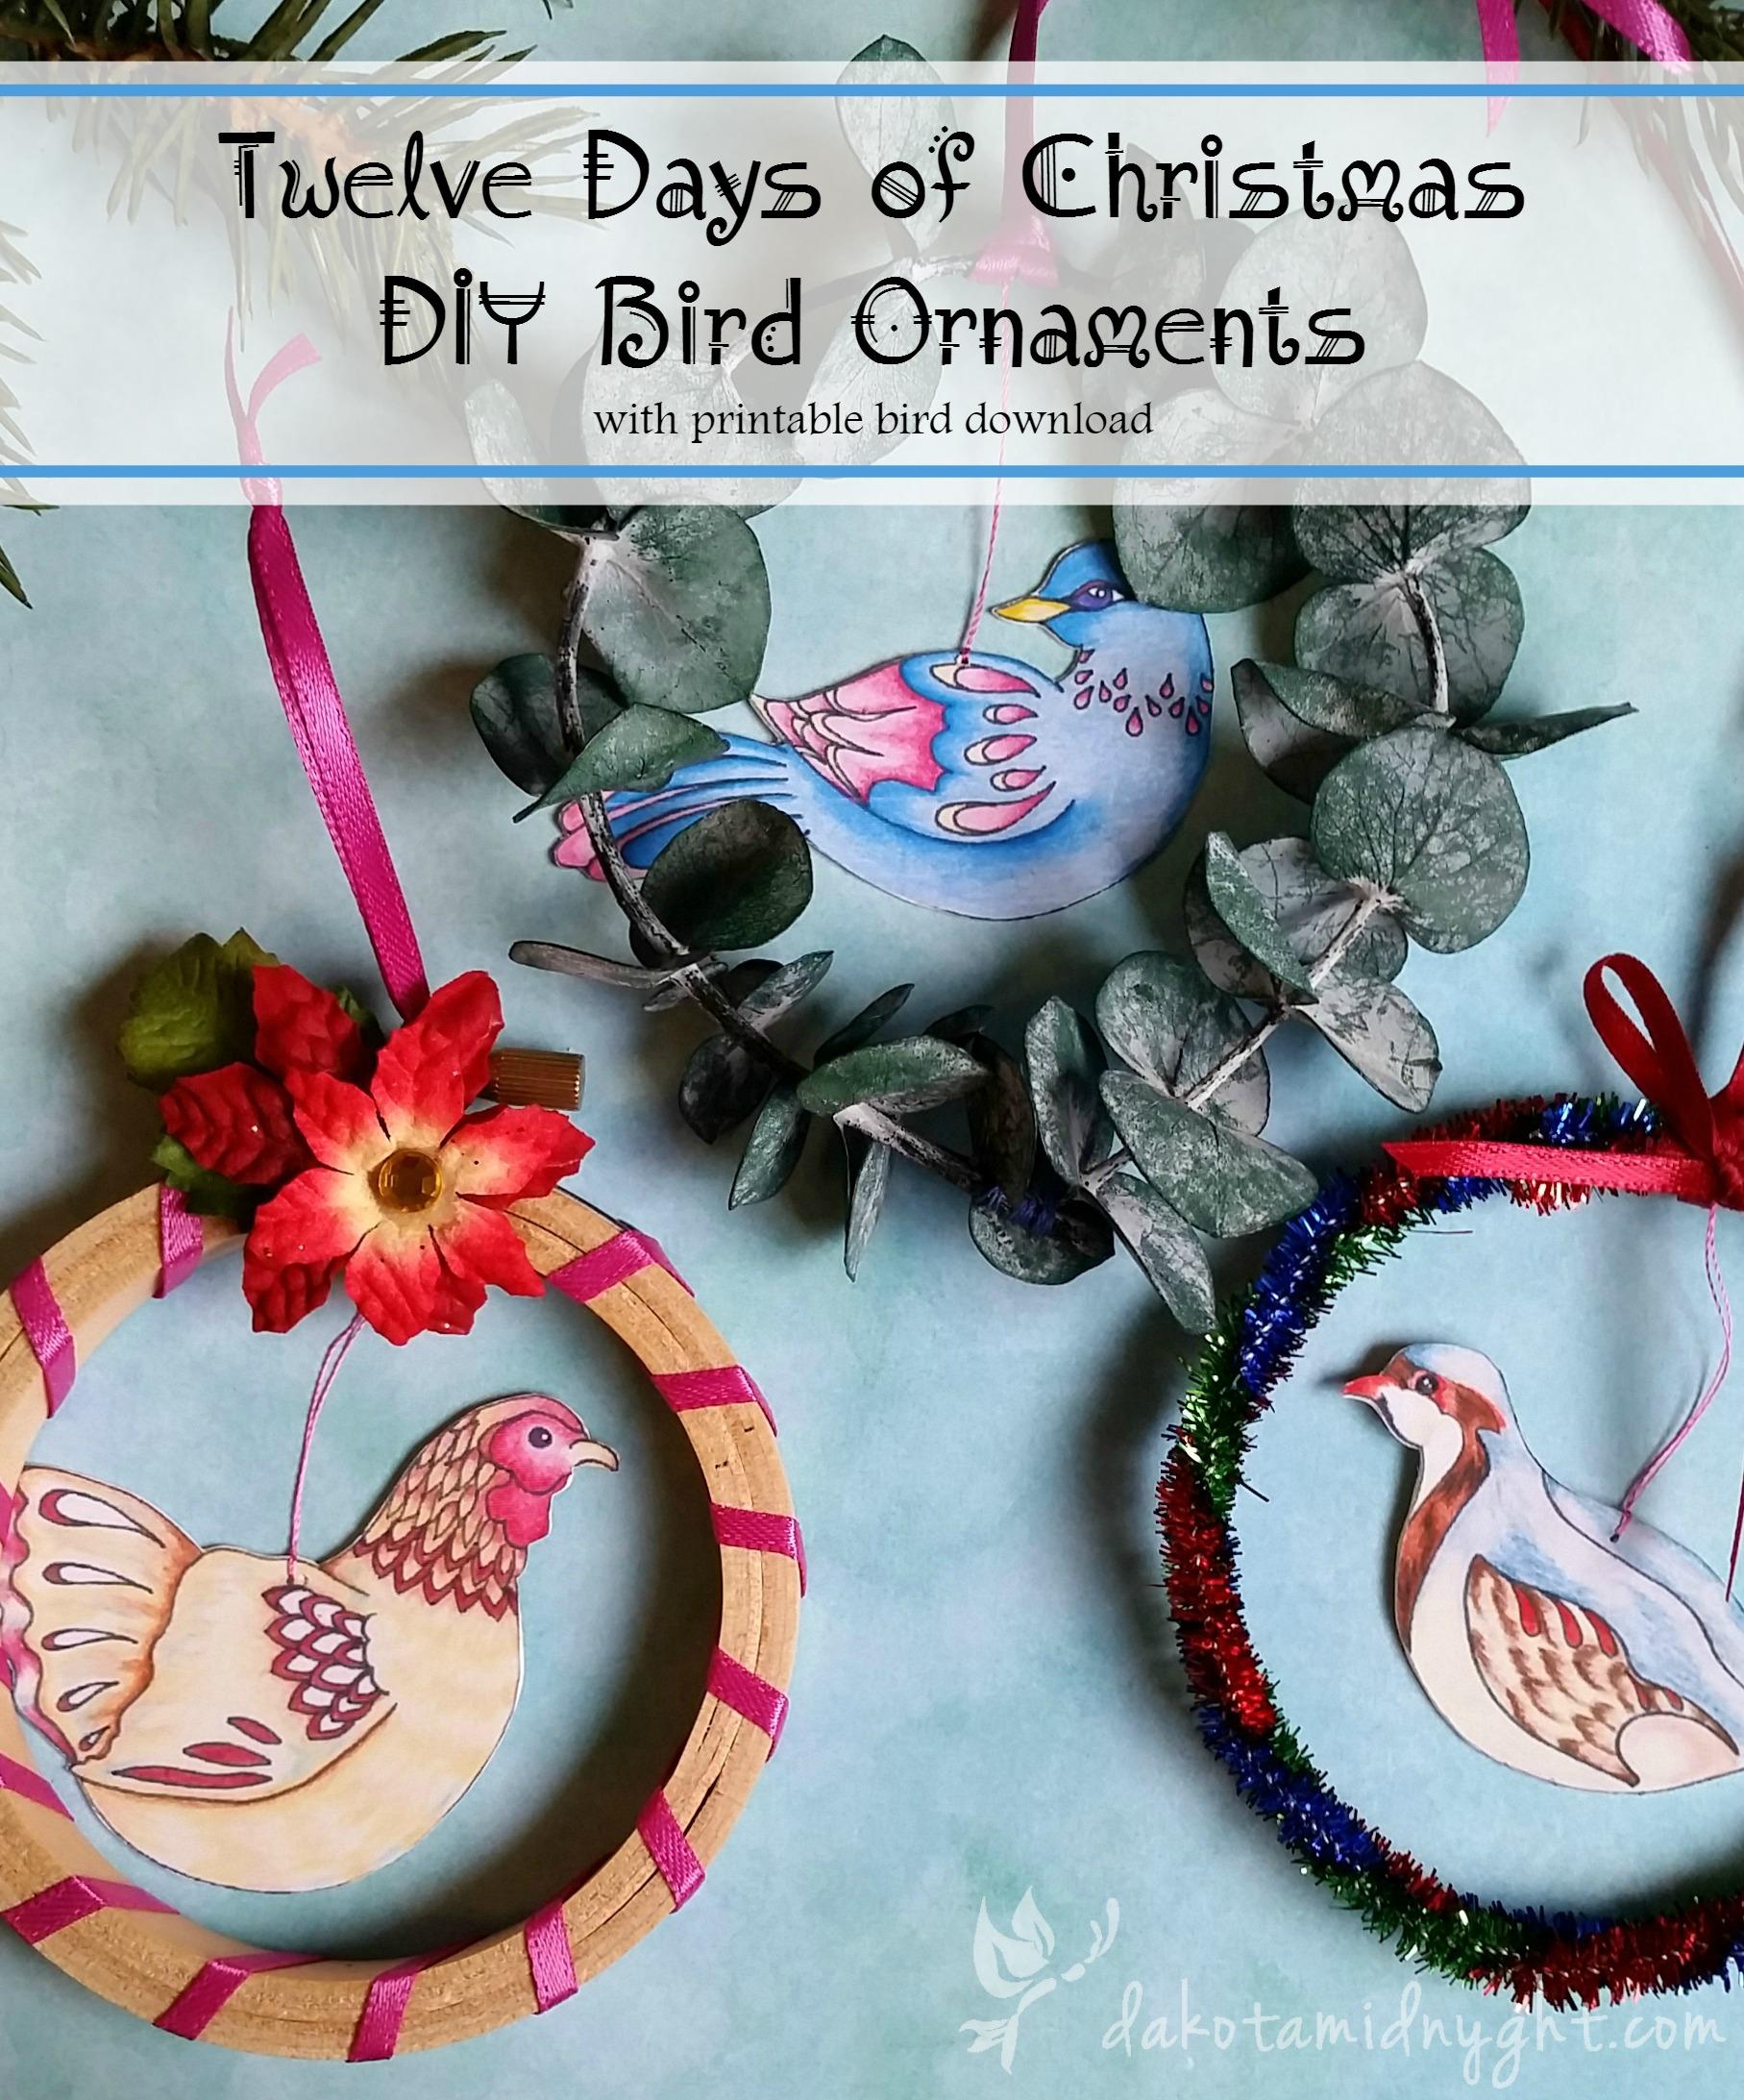 Free printable download for Twelve Days of Christmas DIY Bird Ornaments   dakotamidnyght.com